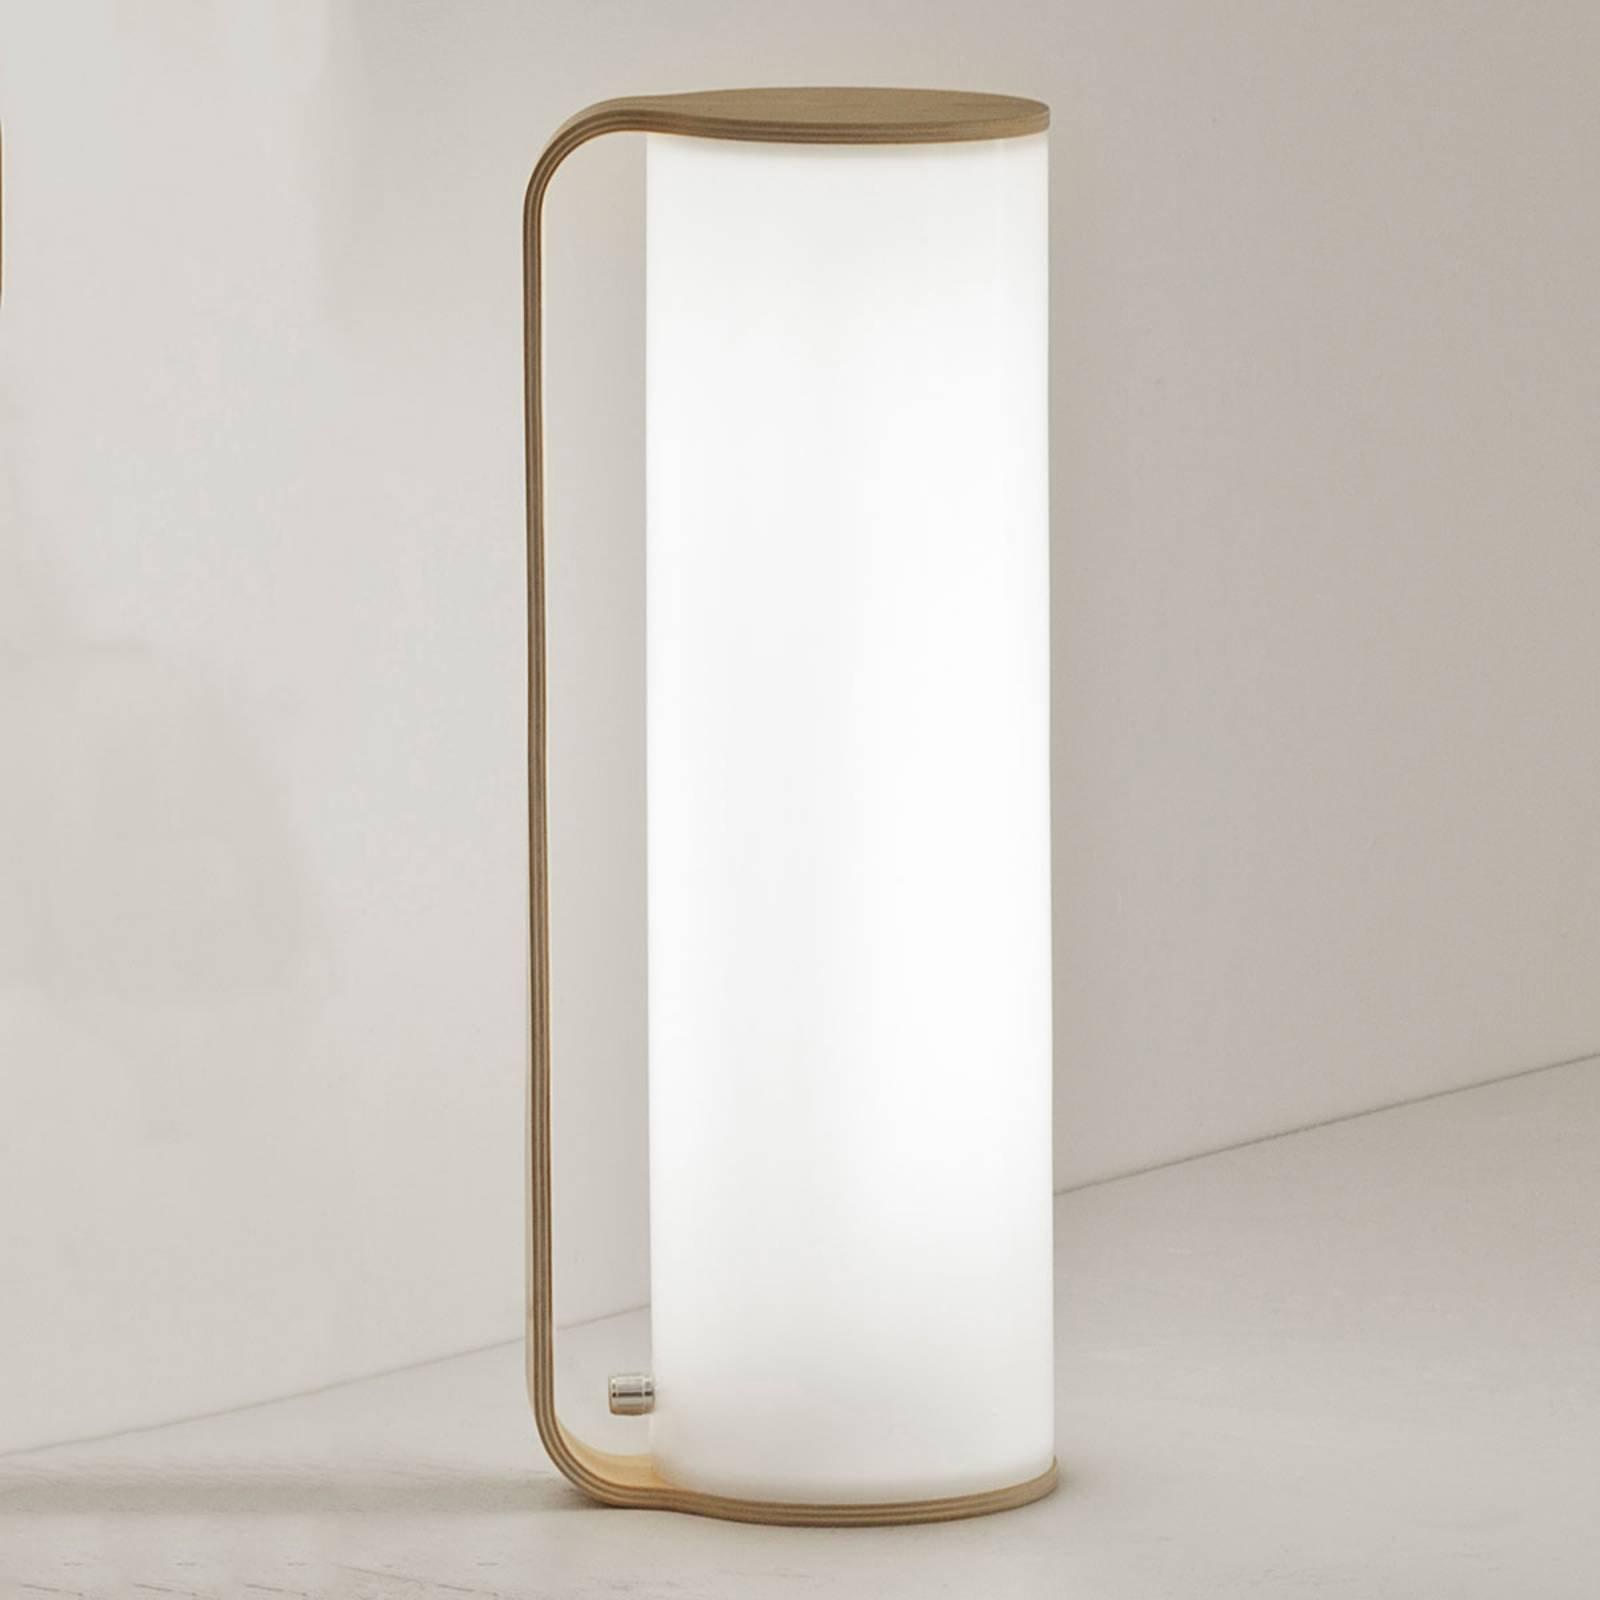 Innolux Tubo LED-terapilampe, dimbar, ask